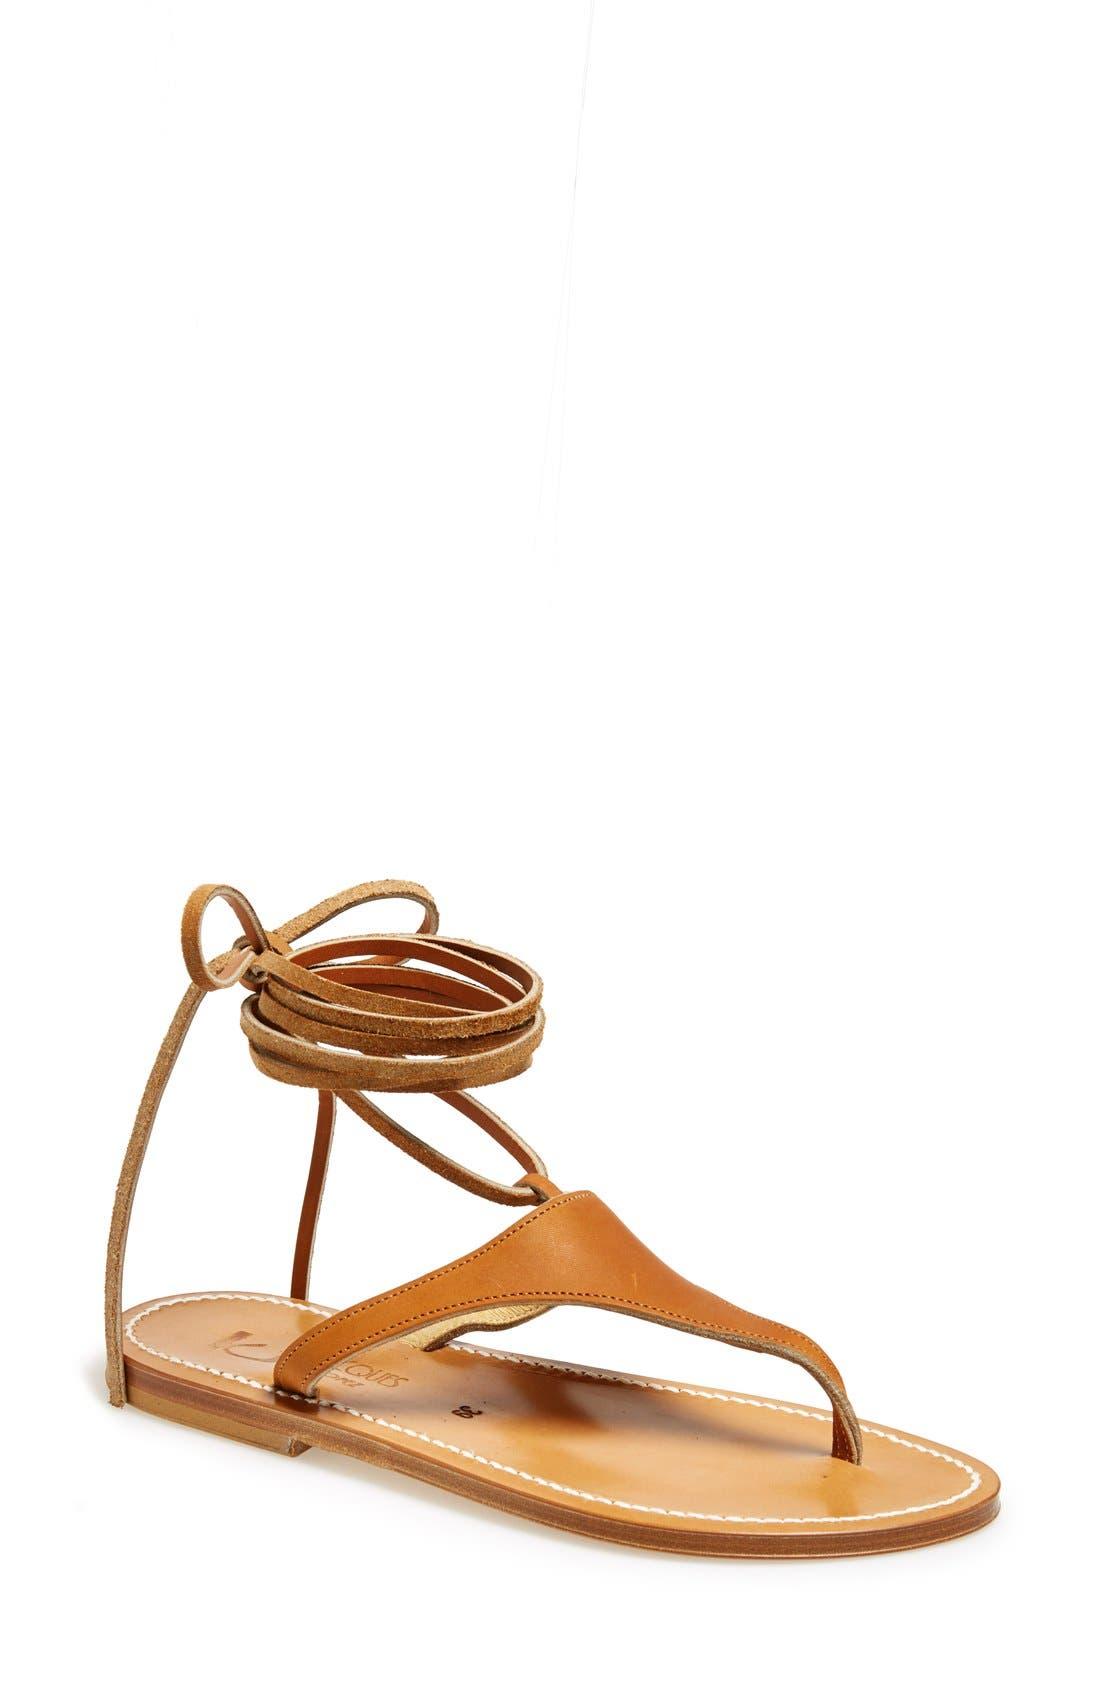 Main Image - K.Jacques St. Tropez Ankle Wrap Thong Sandal (Women)